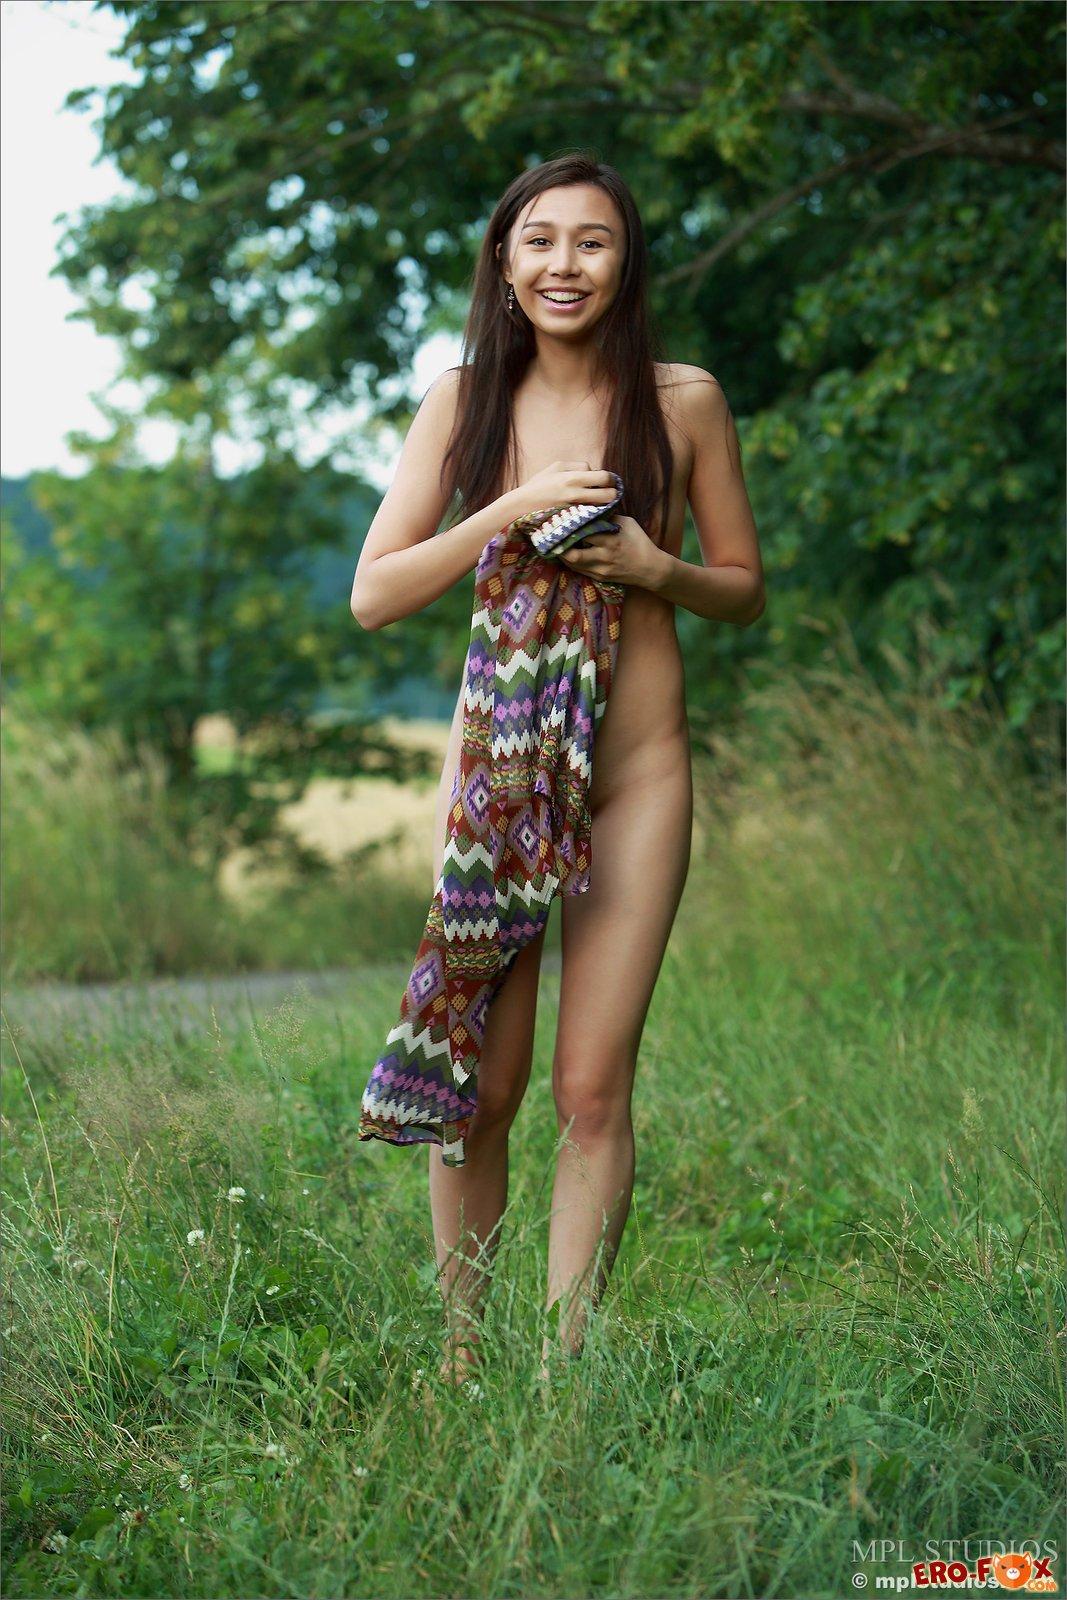 Голая азиатка брюнетка на природе